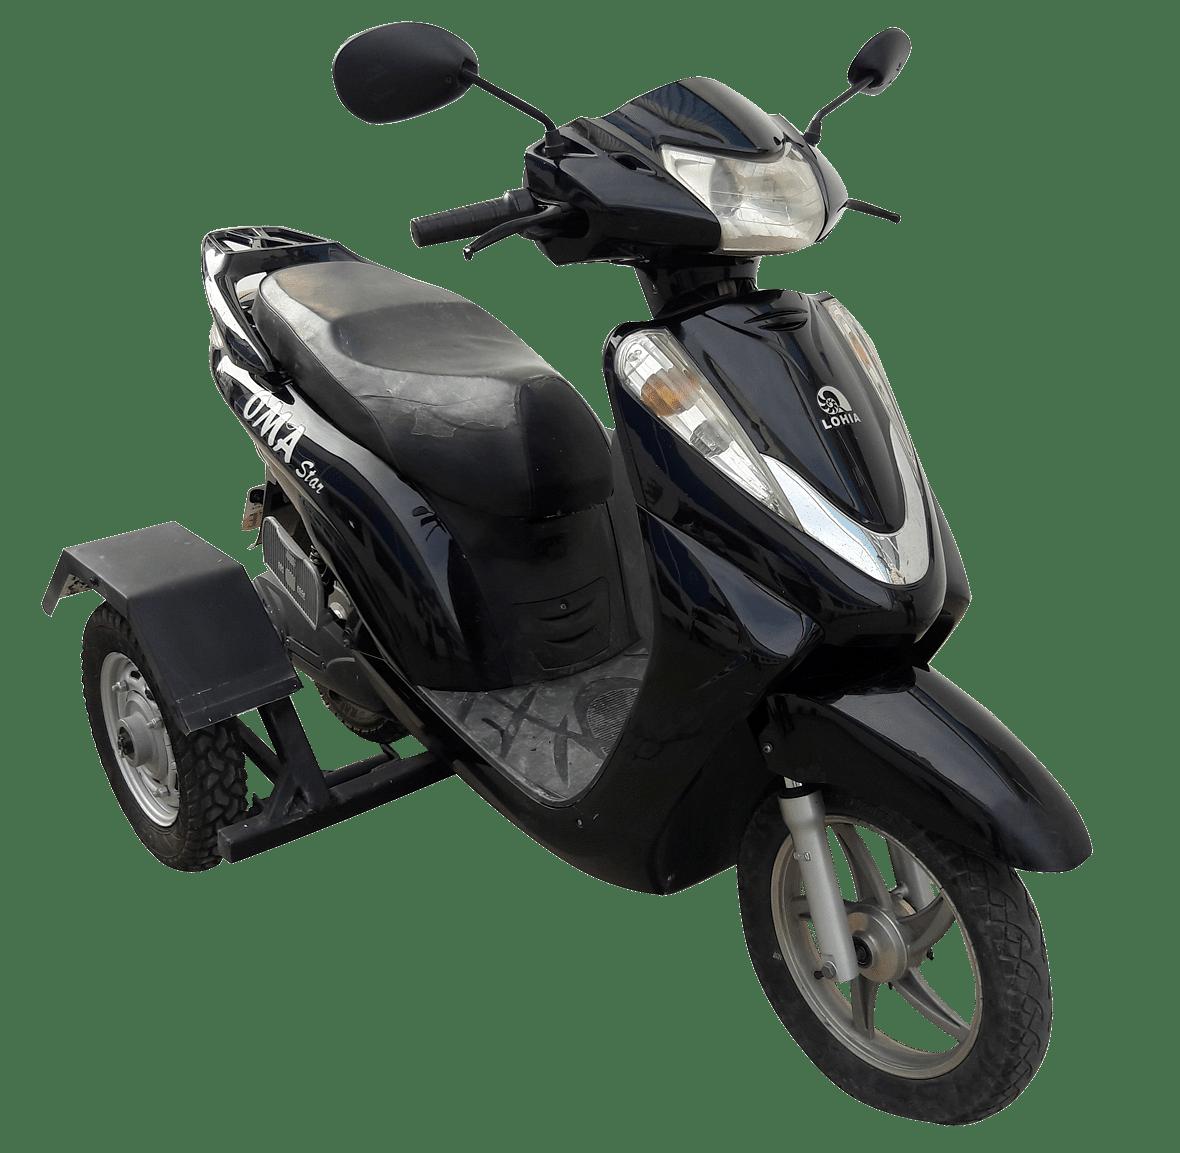 EV Expo 2017: Lohia Auto unveils Oma Star Spl e-scooter